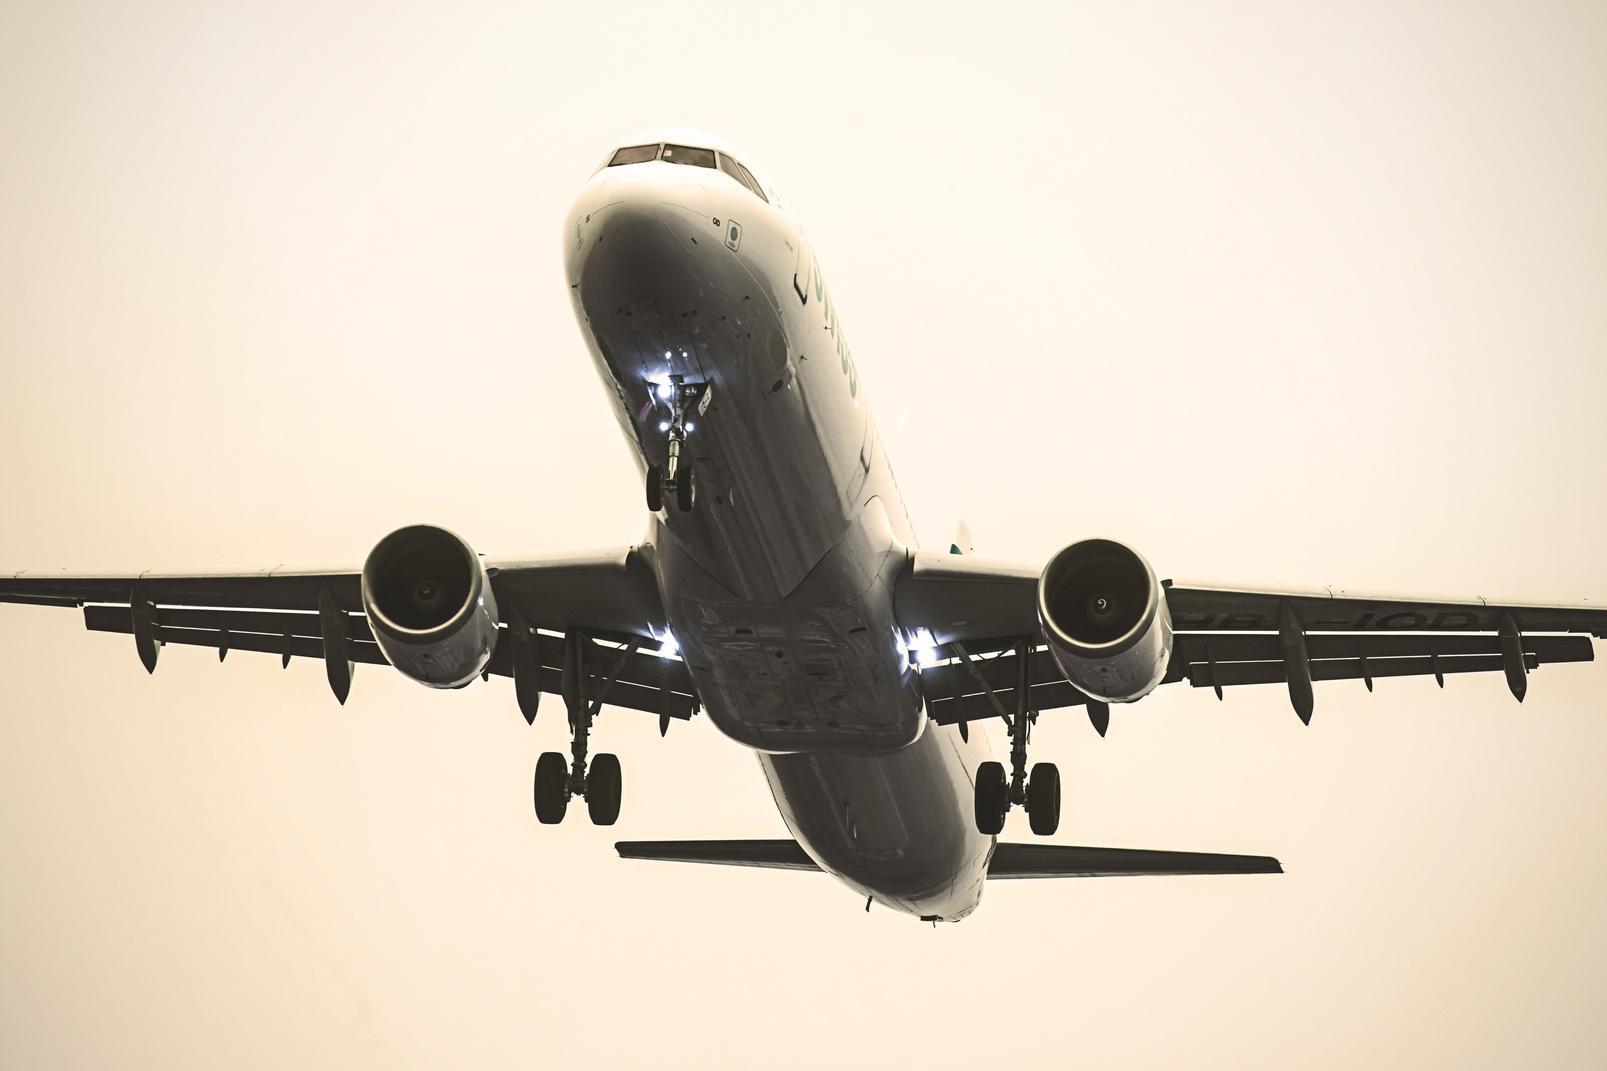 Billigflüge ab BaselBilligflüge| Günstig Flüge ab Basel